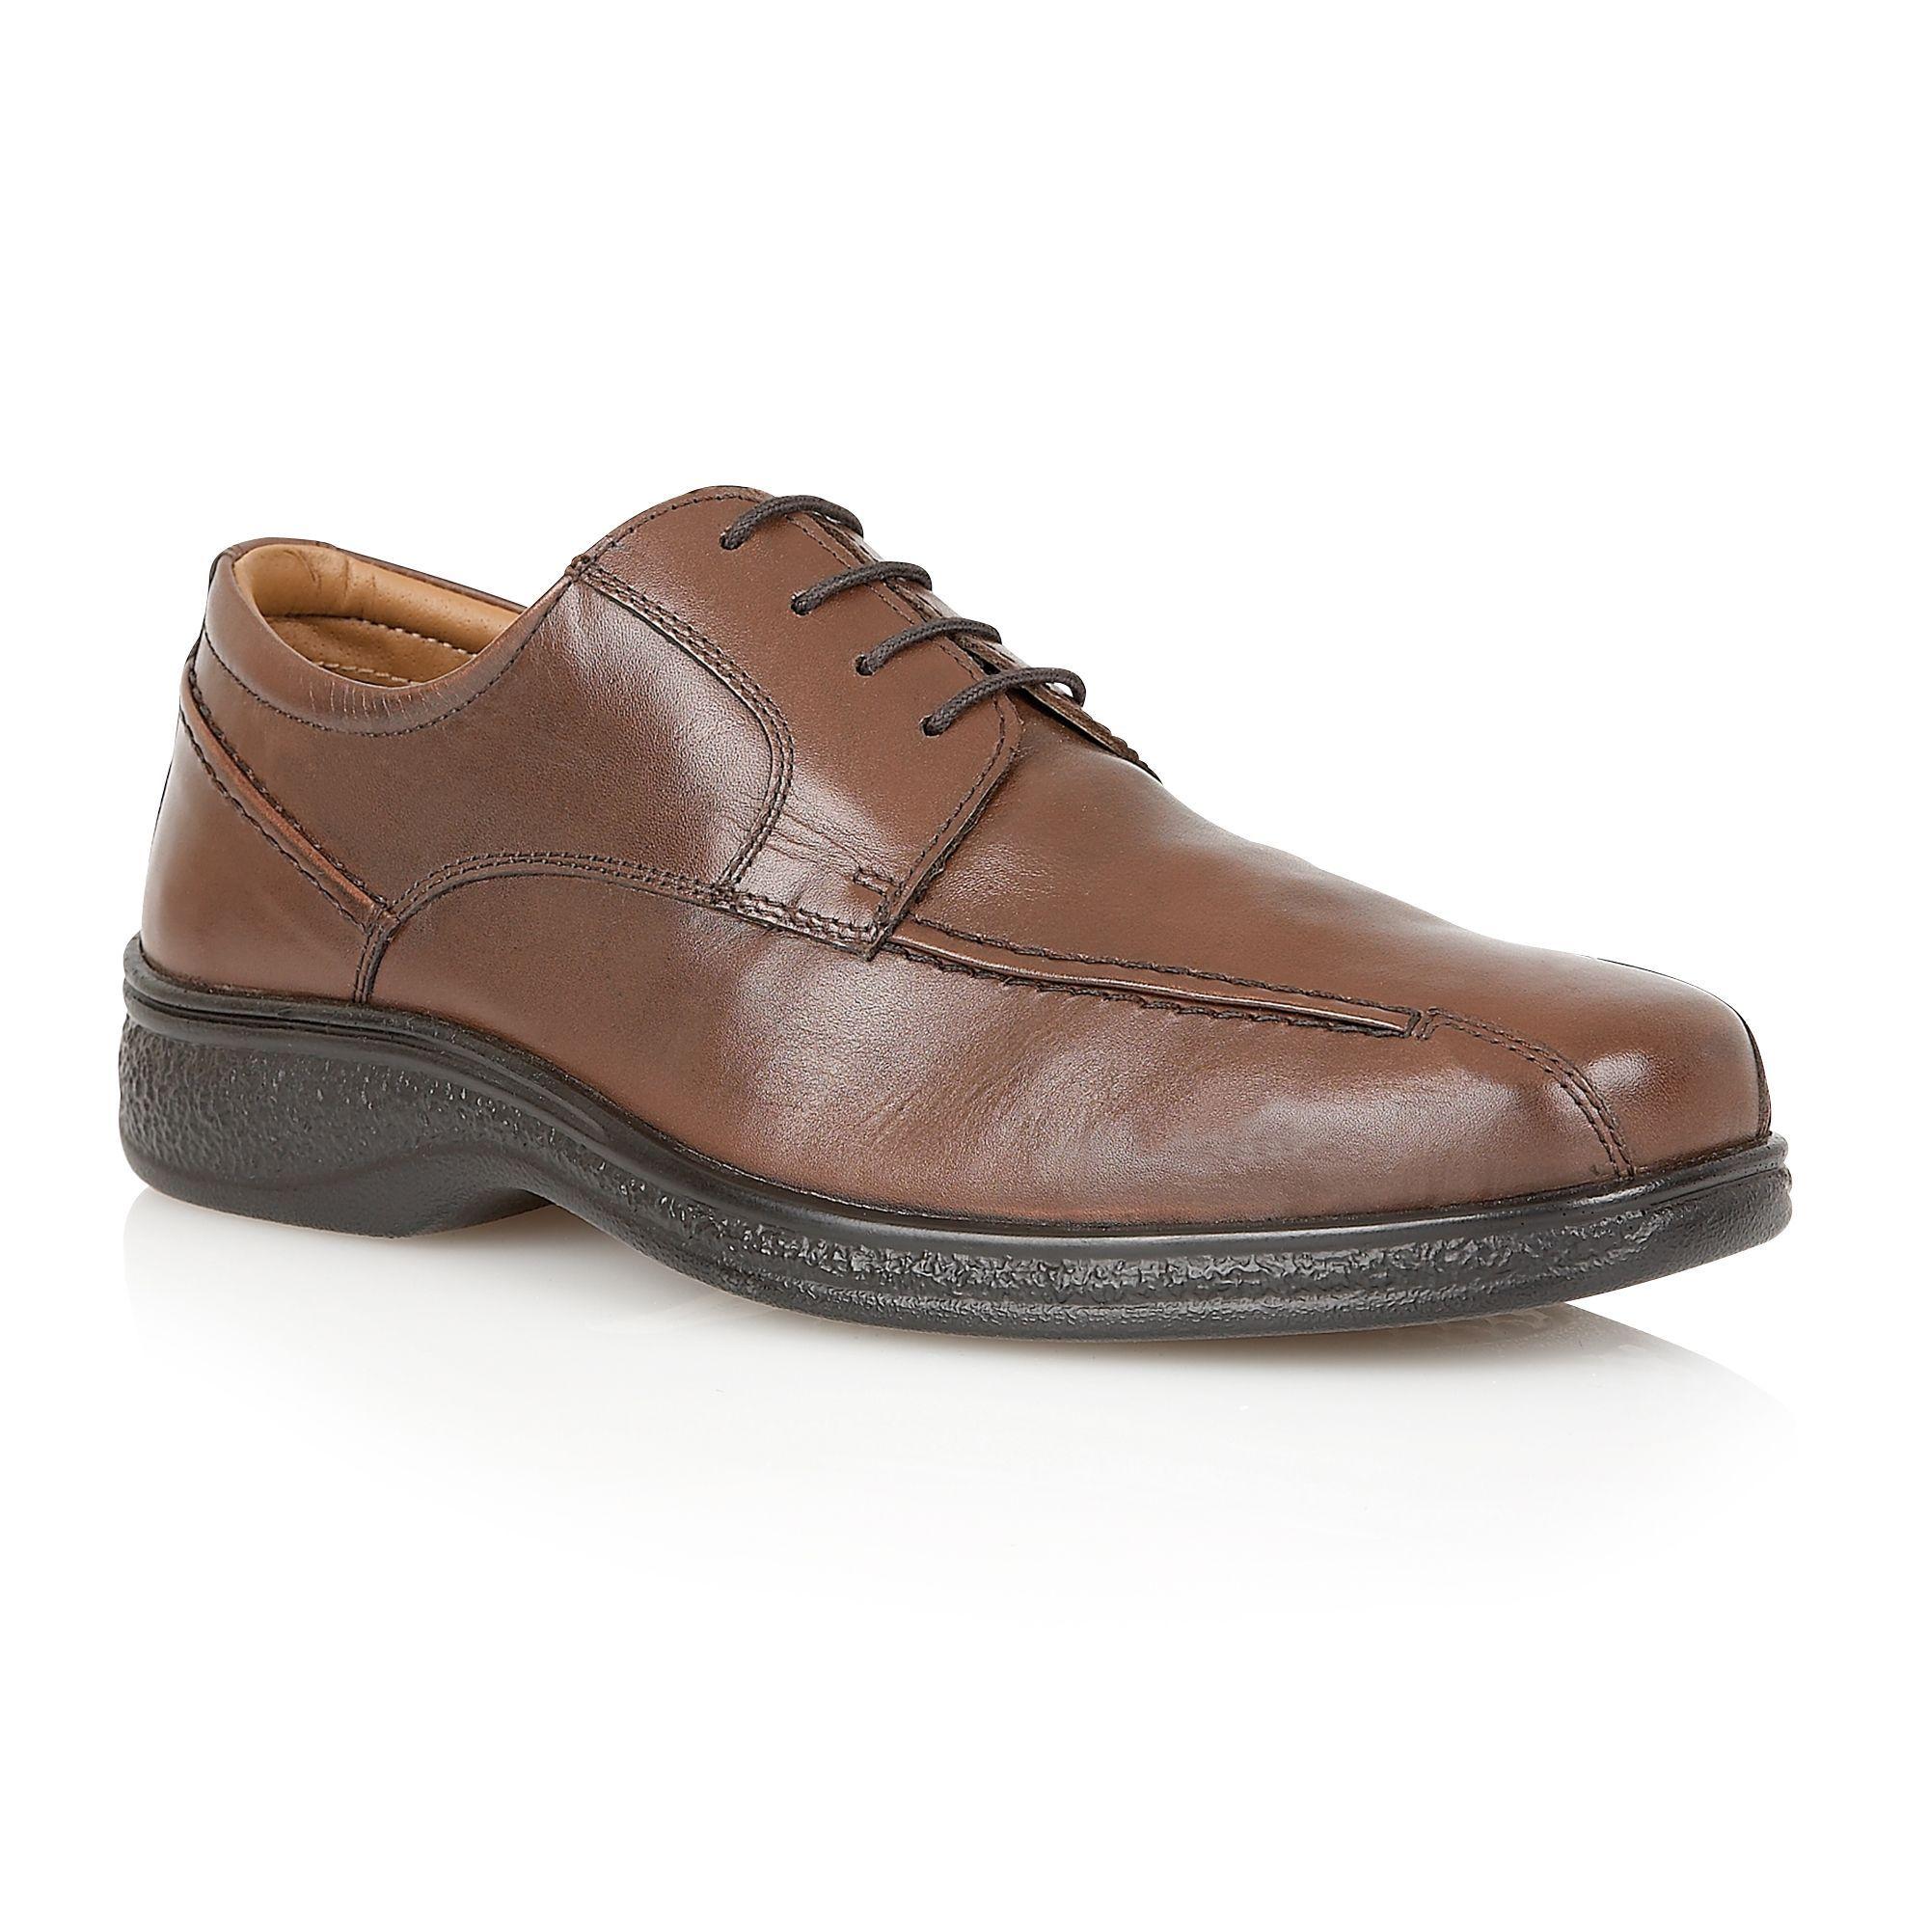 Lotus Since 1759 Morden mens lace up shoes, Brown